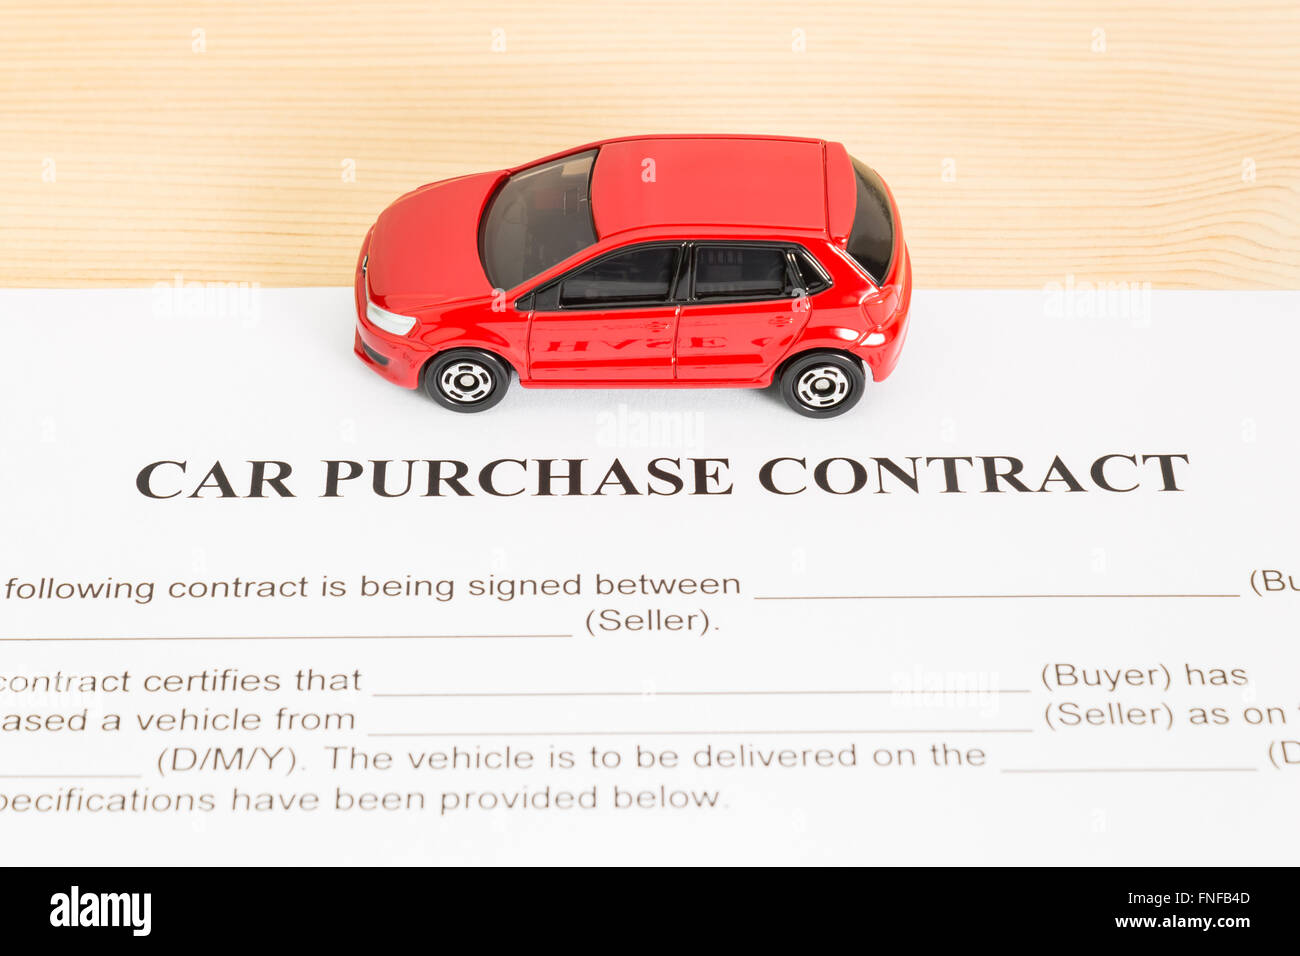 Car Purchase Contract Stock Photos & Car Purchase Contract Stock ...